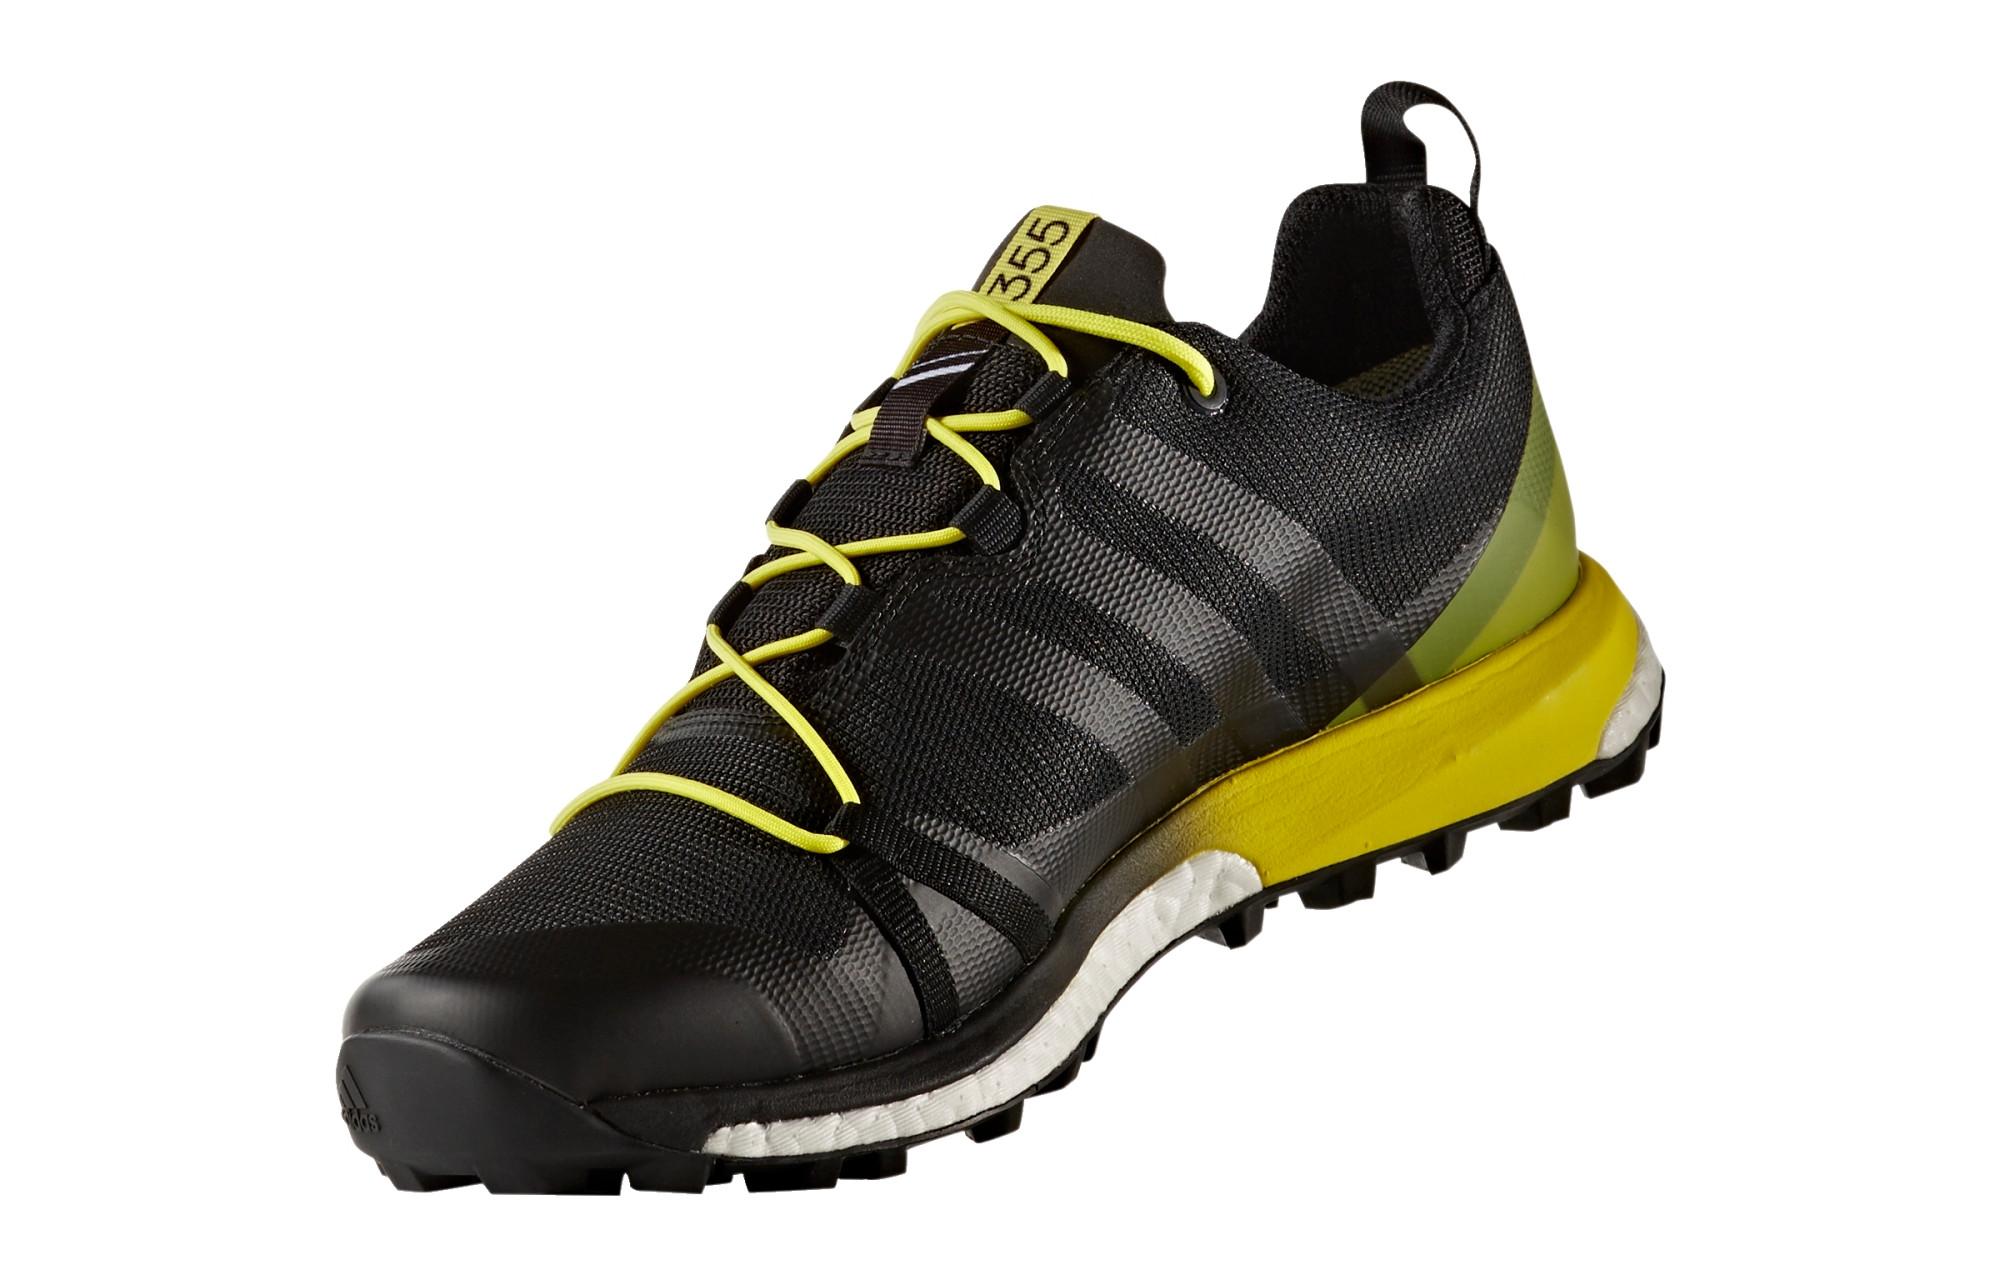 Noir De Chaussures Adidas Trail Gtx Jaune Agravic Running Terrex g4dH0nxwqd